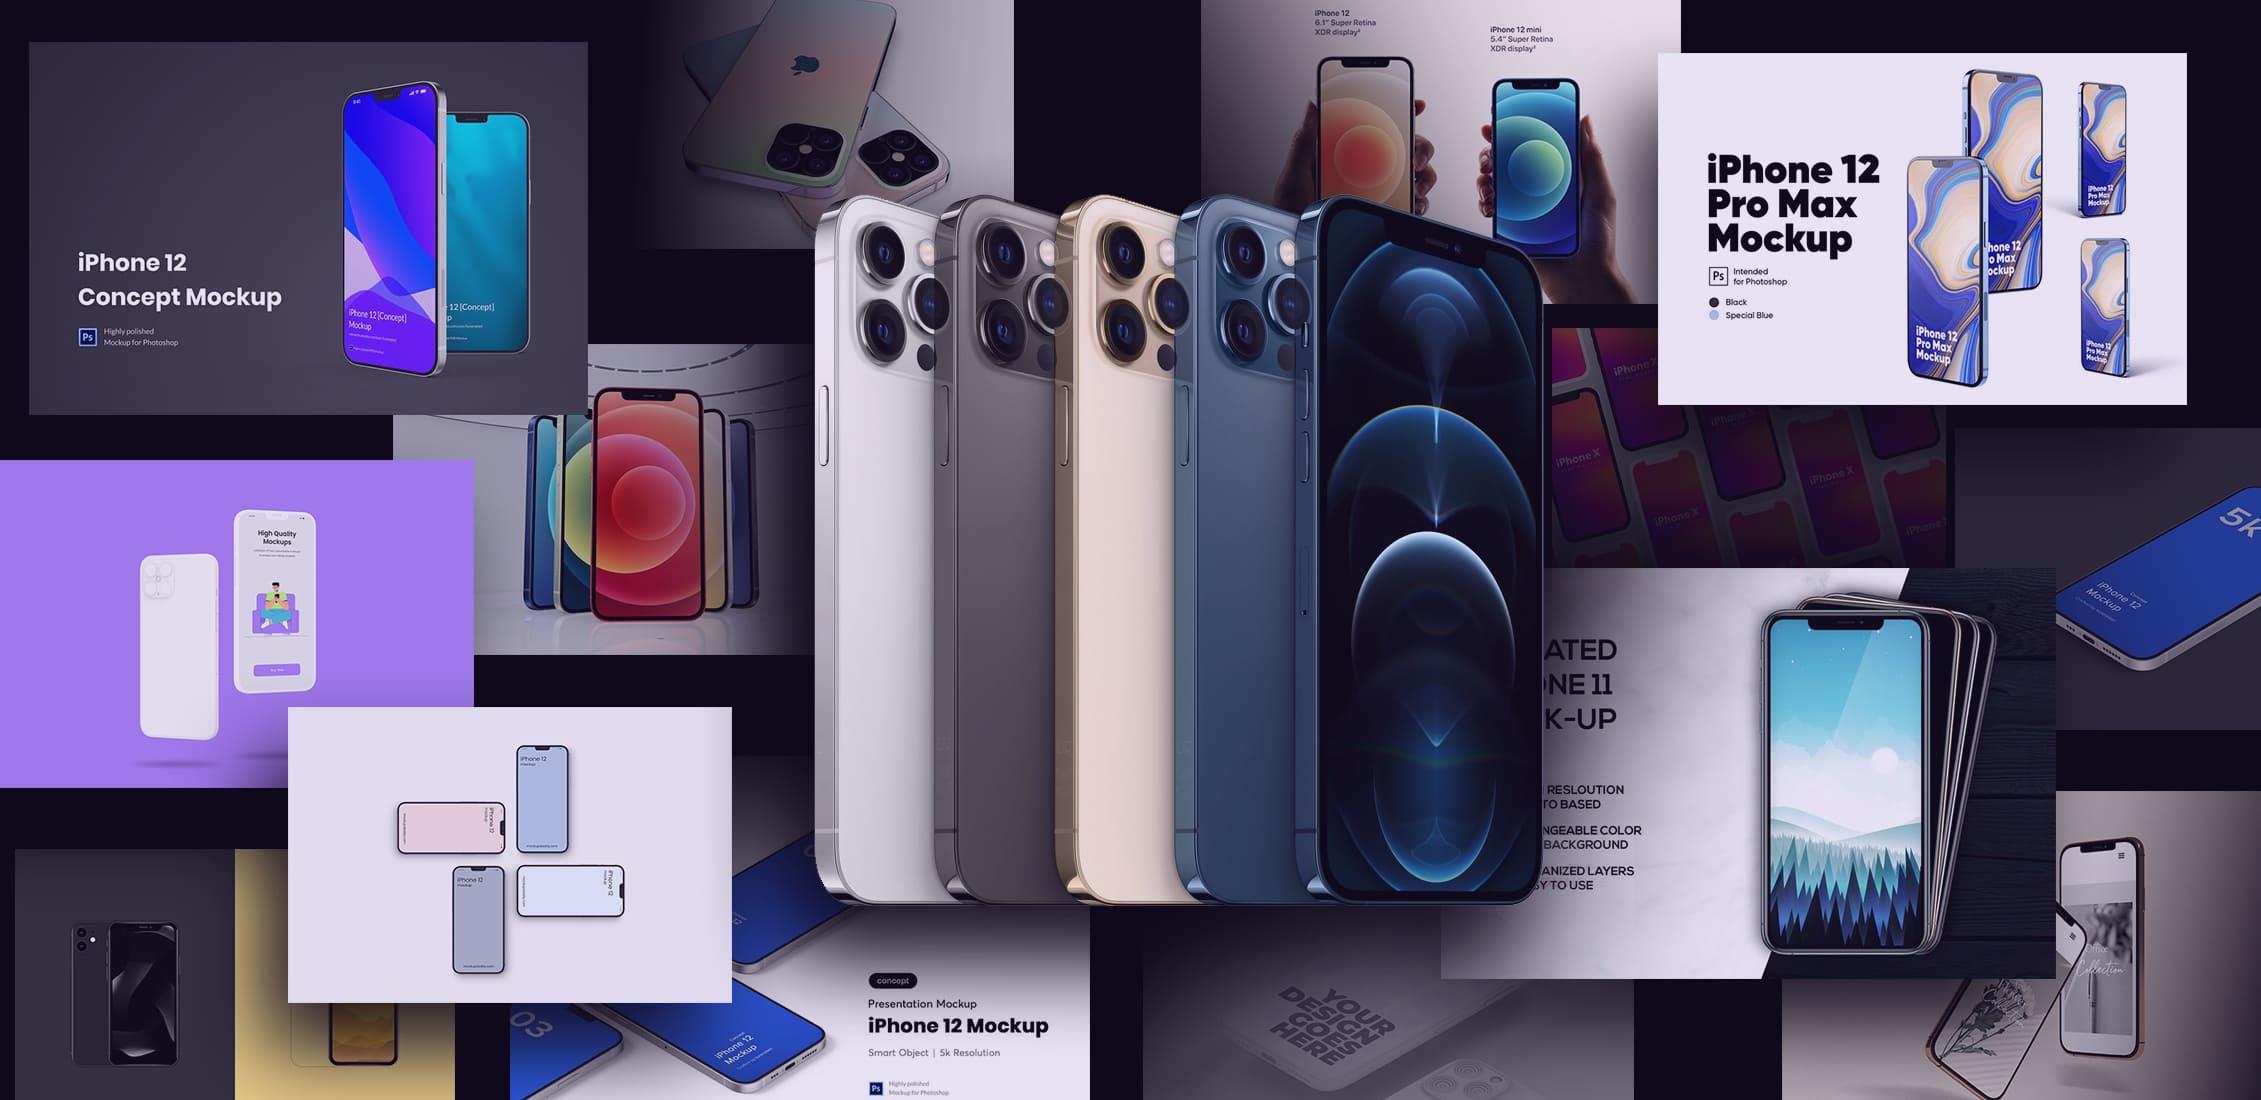 Examples Best iPhone 12 Mockup: Mini, Pro, Max.